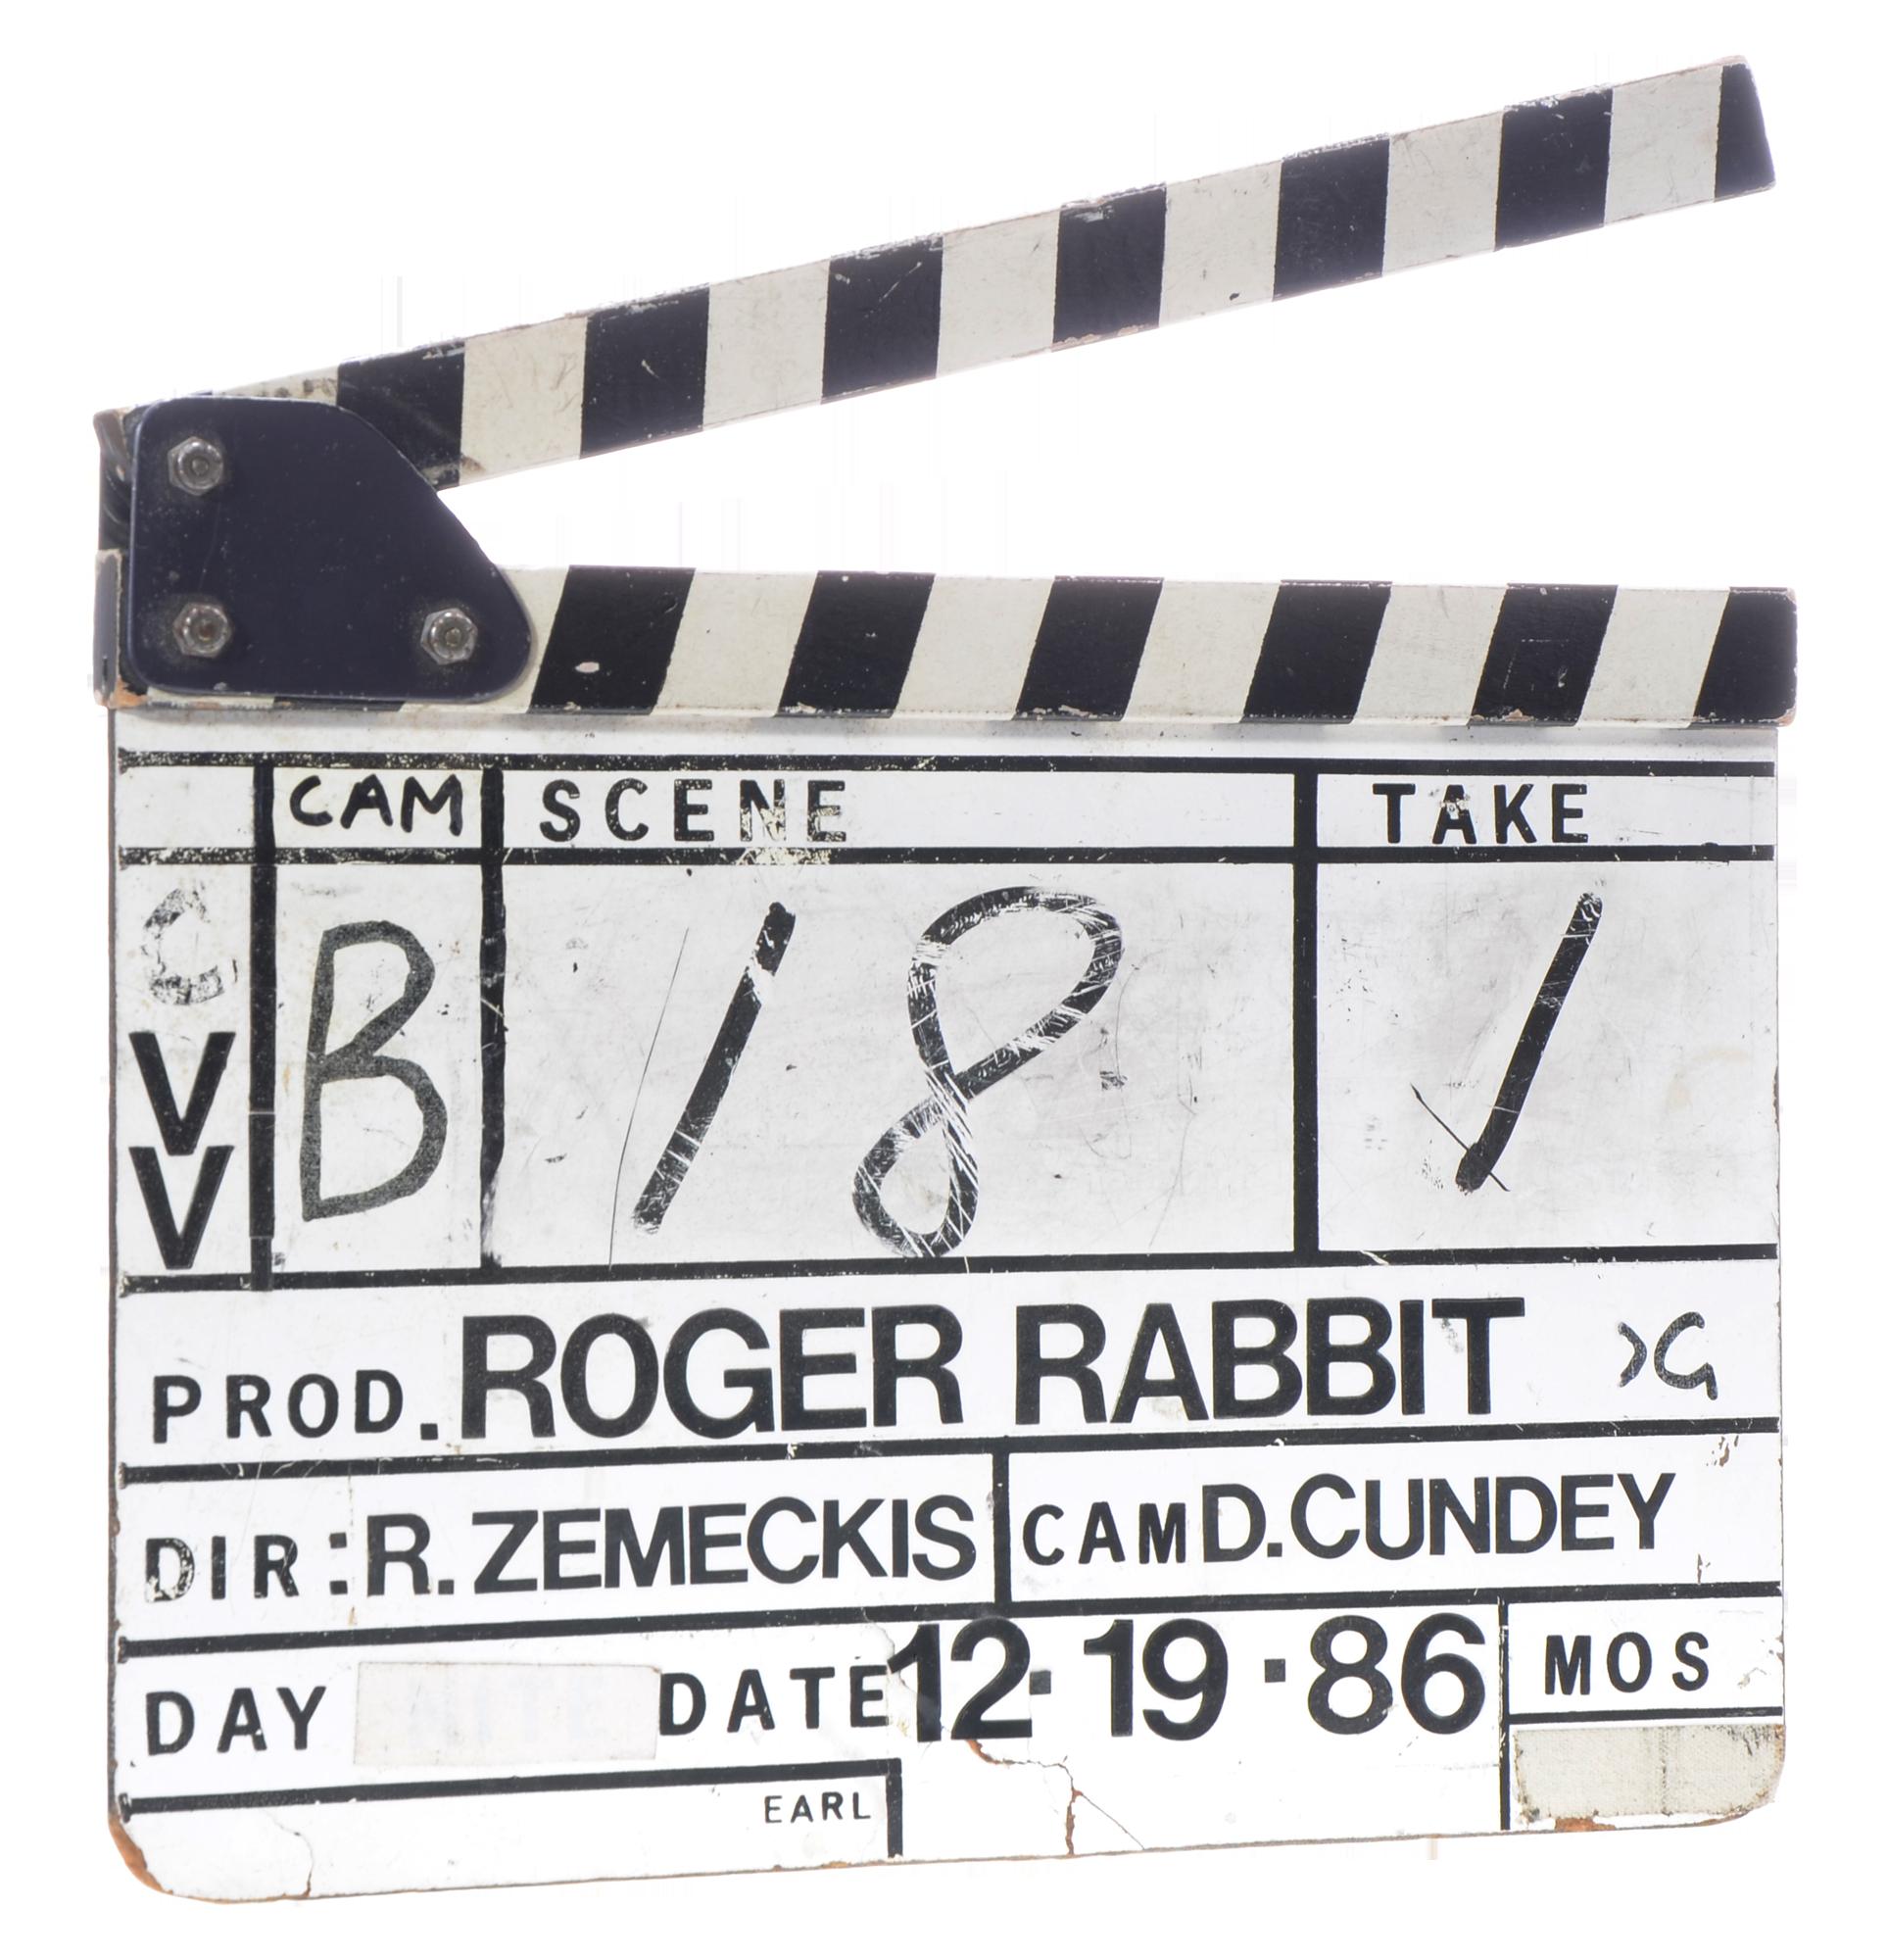 clapboard from who framed roger rabbit - Who Framed Roger Rabbit Soundtrack